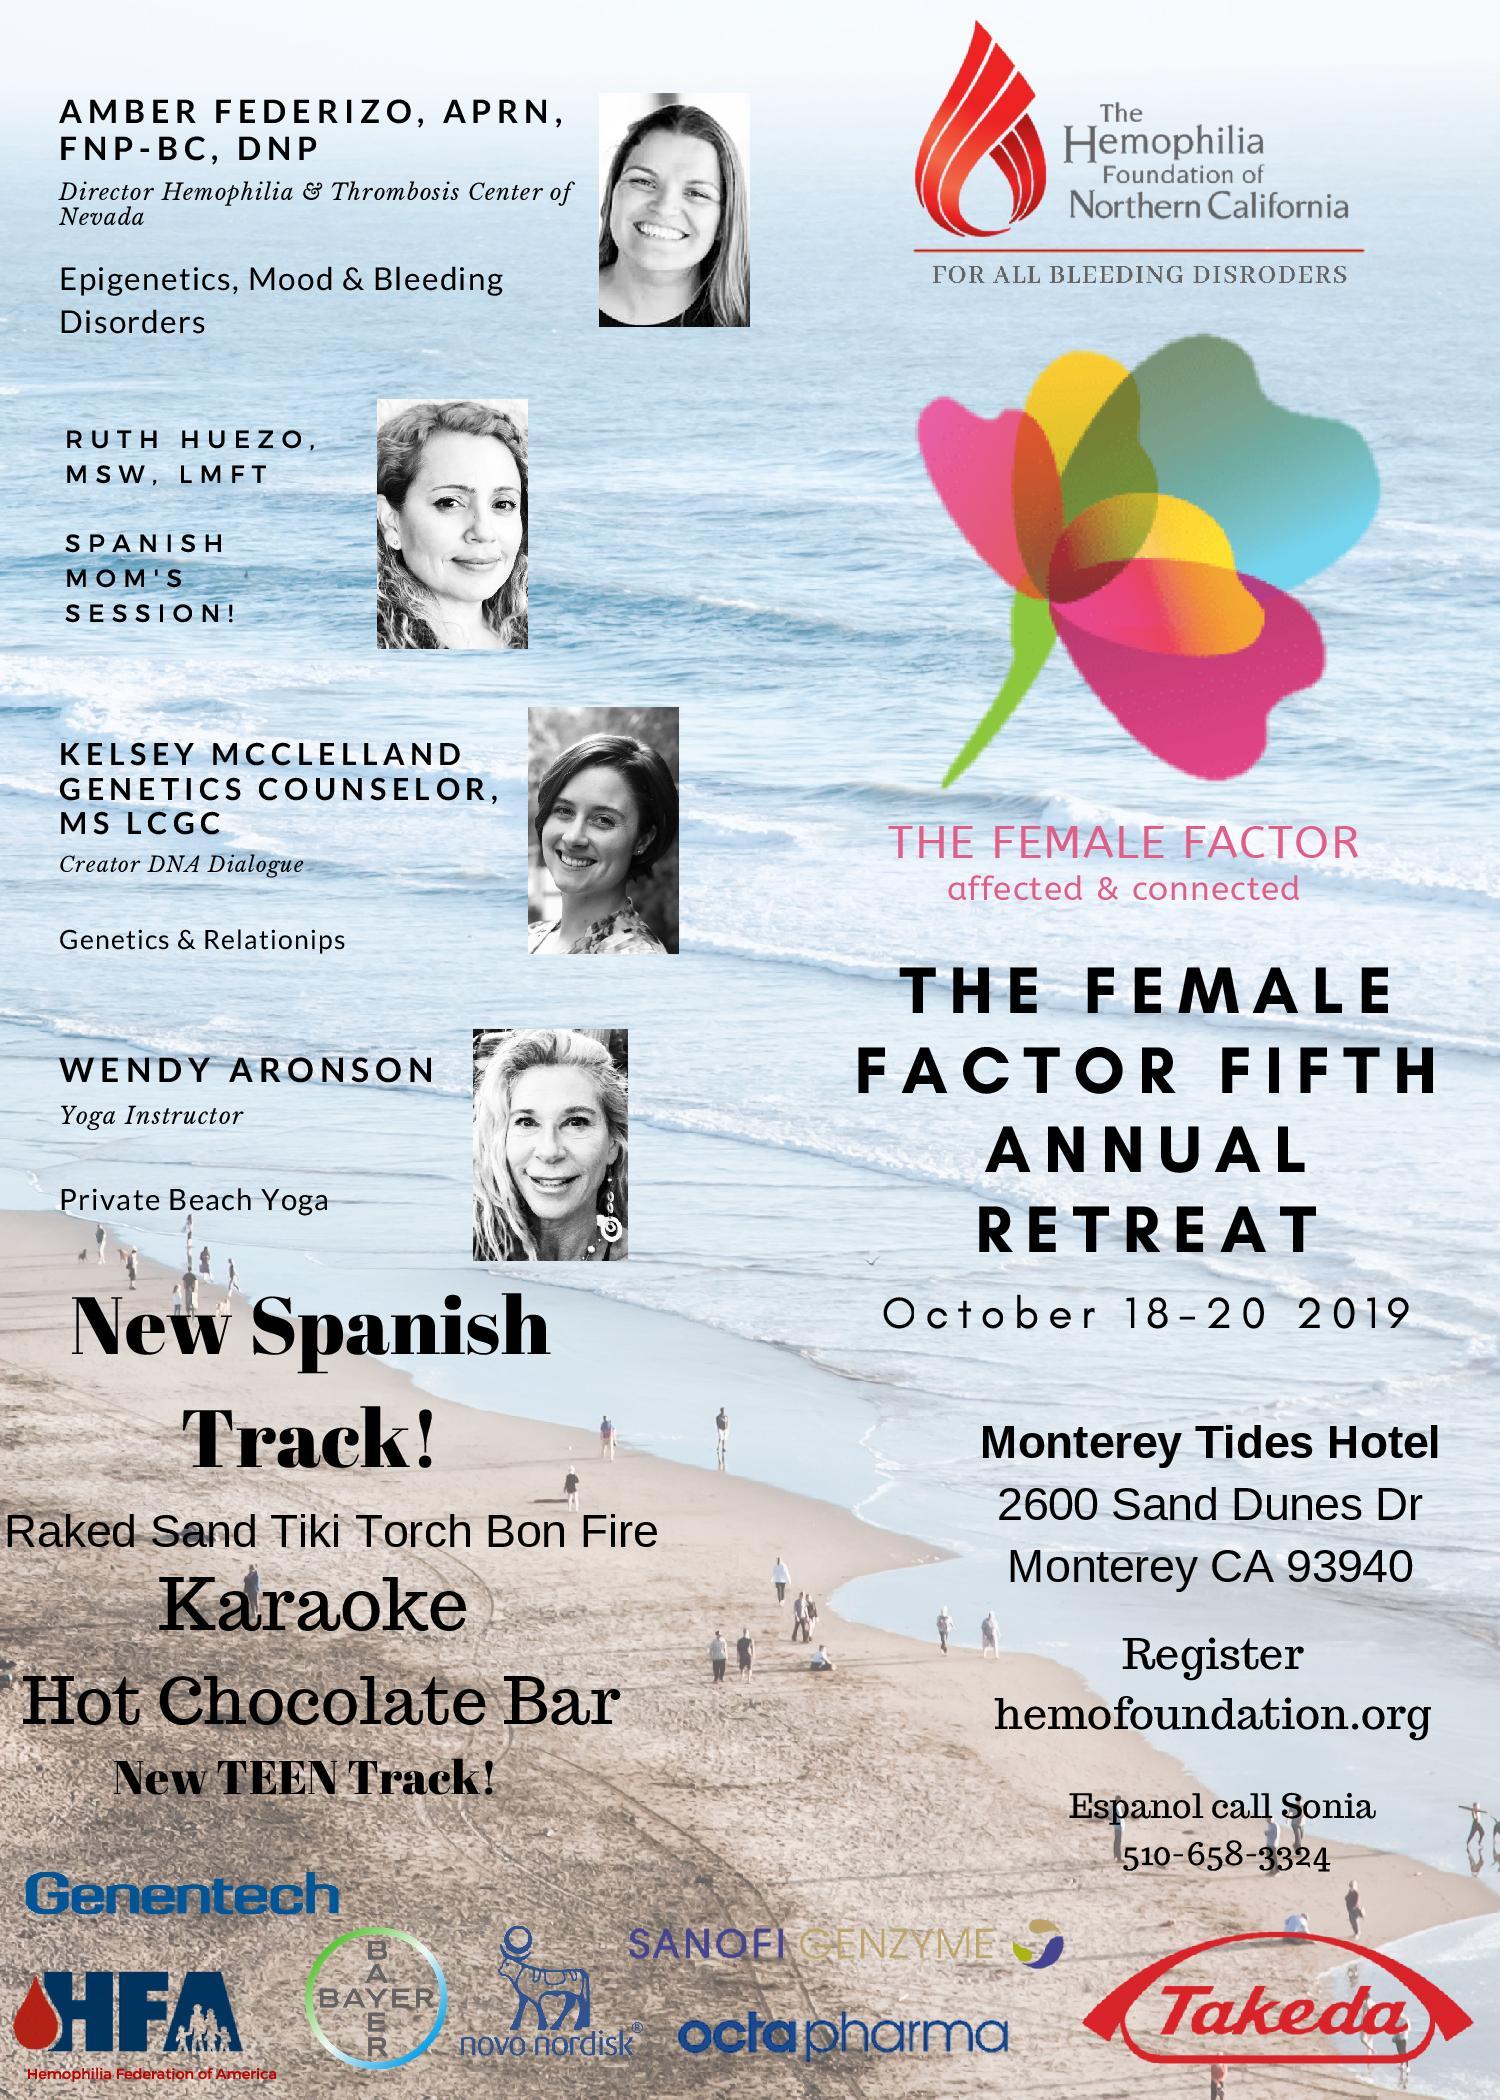 The Female Factor Women's Retreat 2019